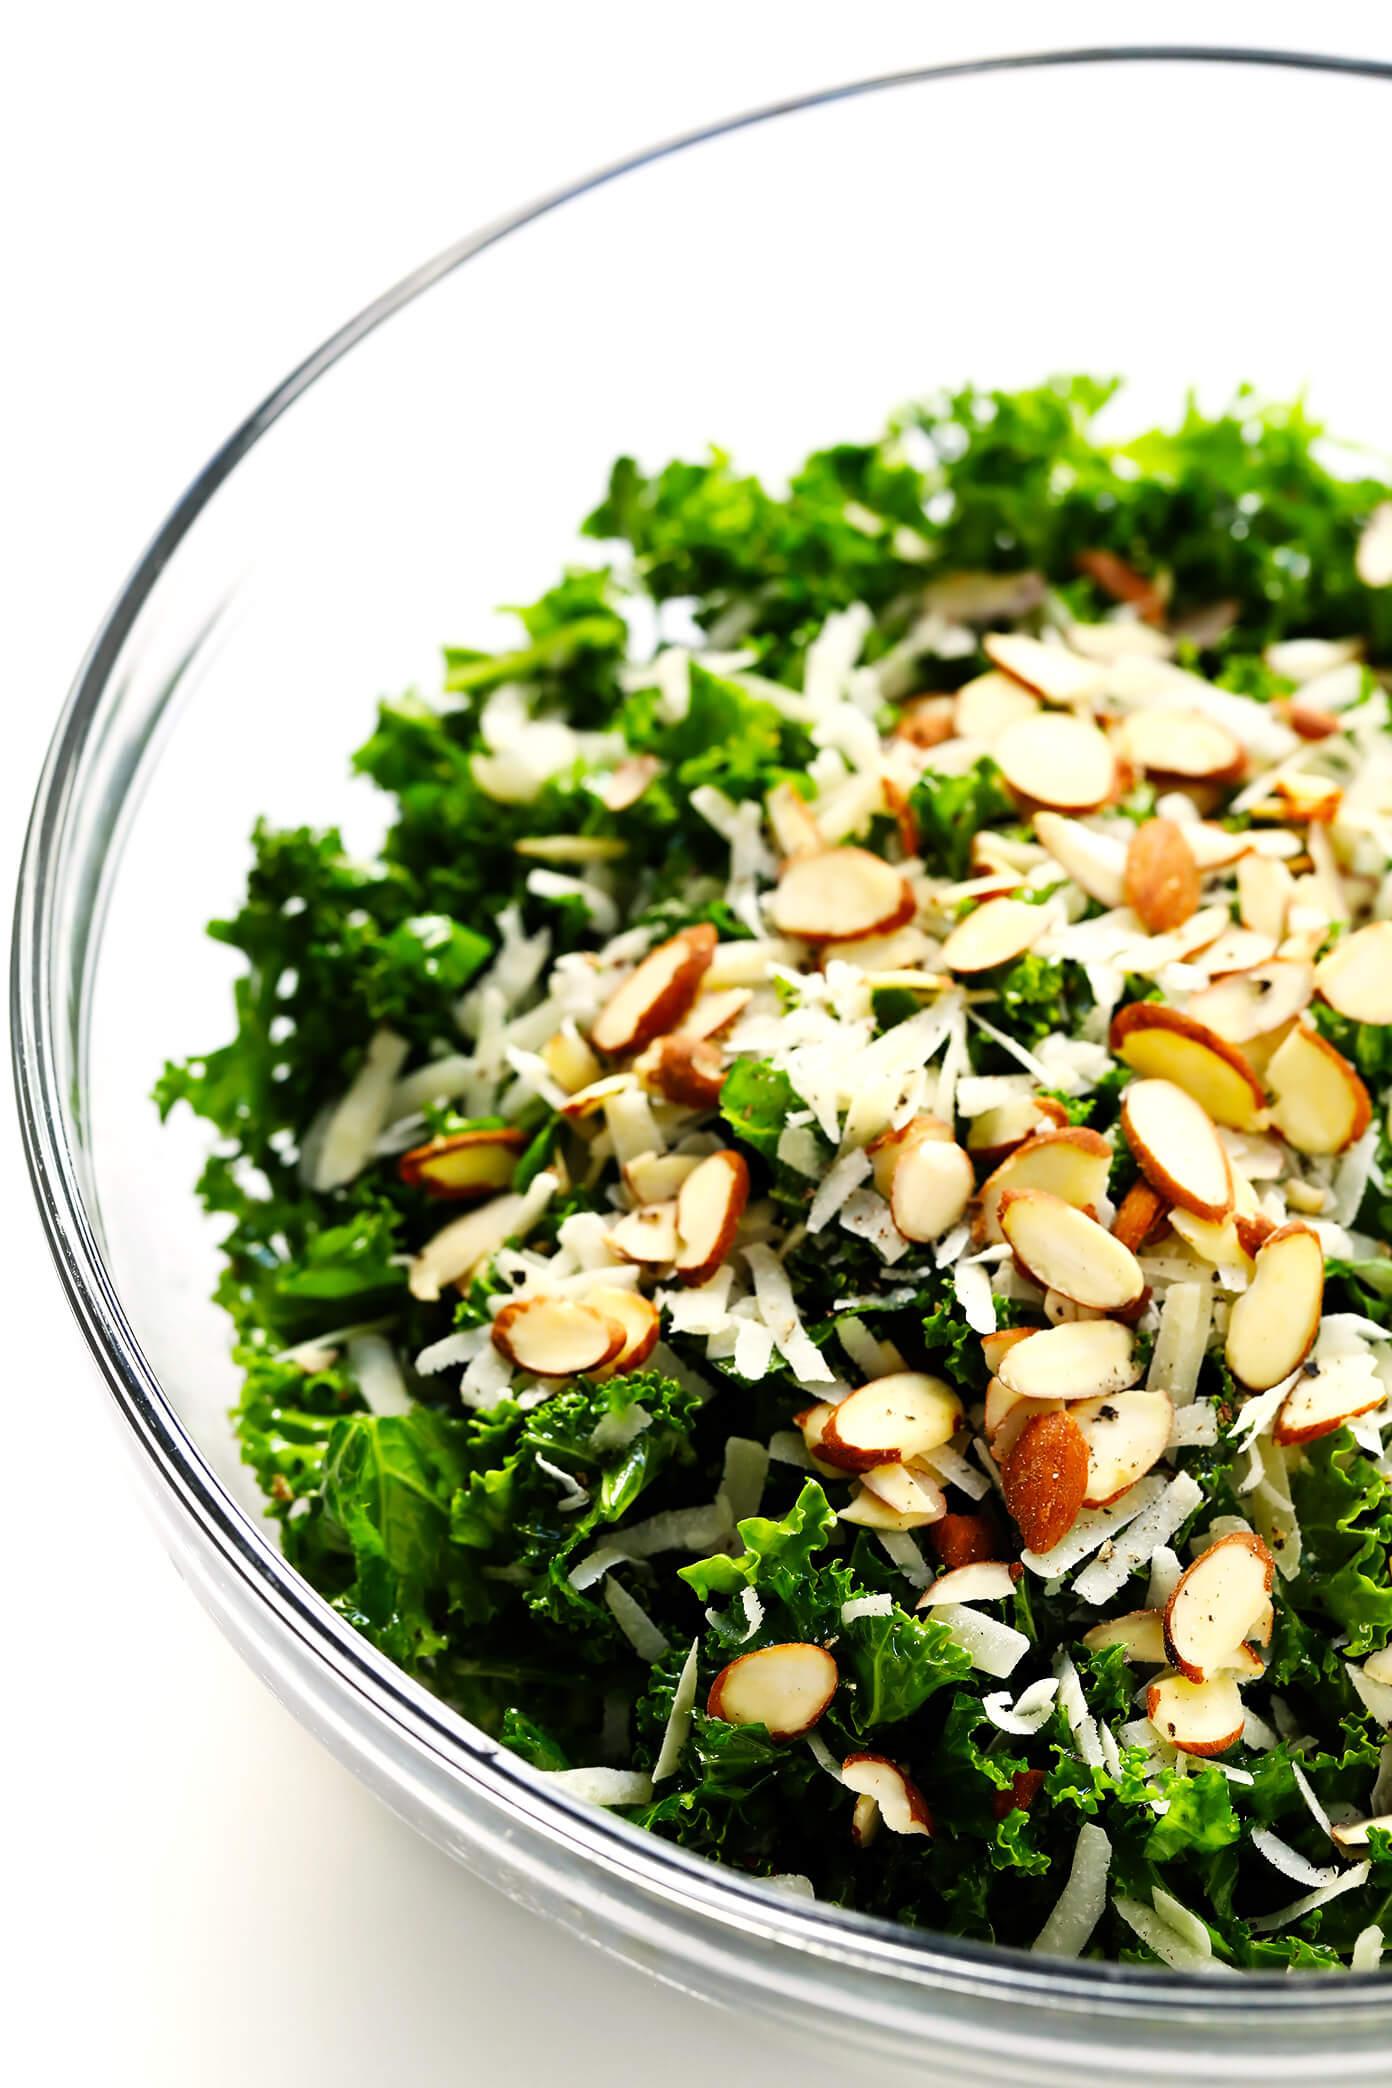 How To Make Kale Salad